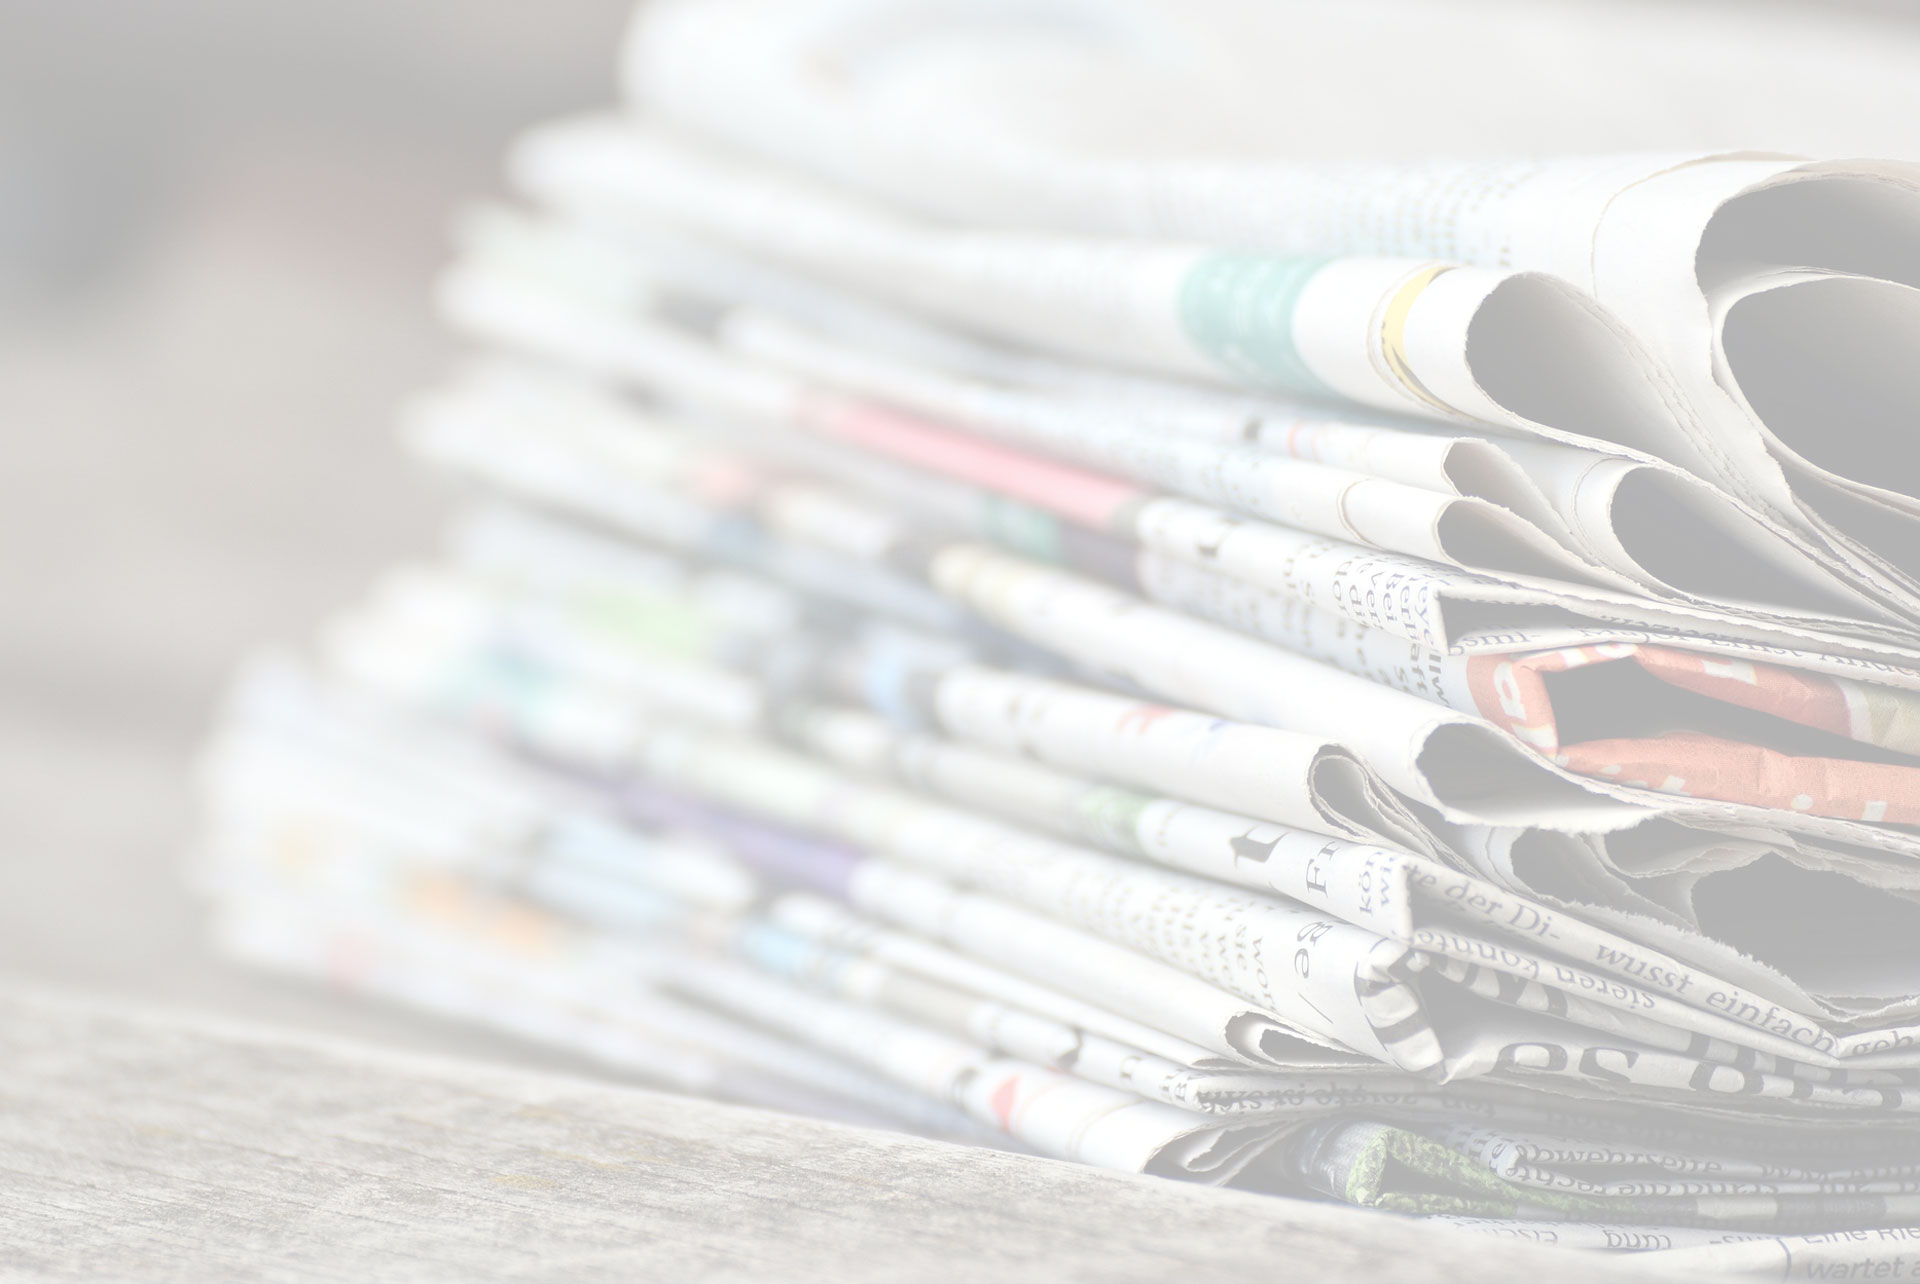 Palacios River Plate